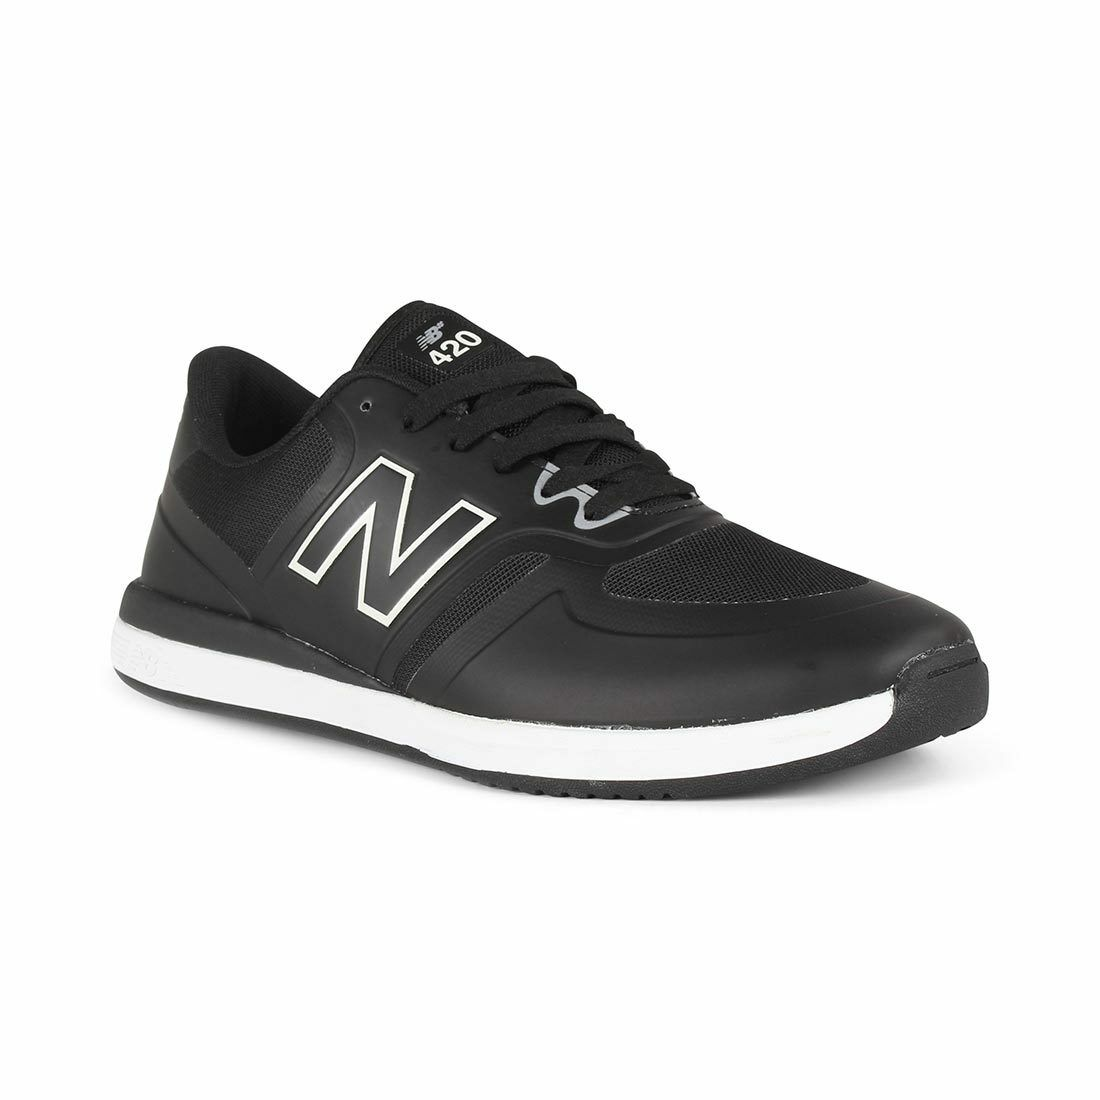 Zapatos Numeric NM420 New Balance-Negro blancoo